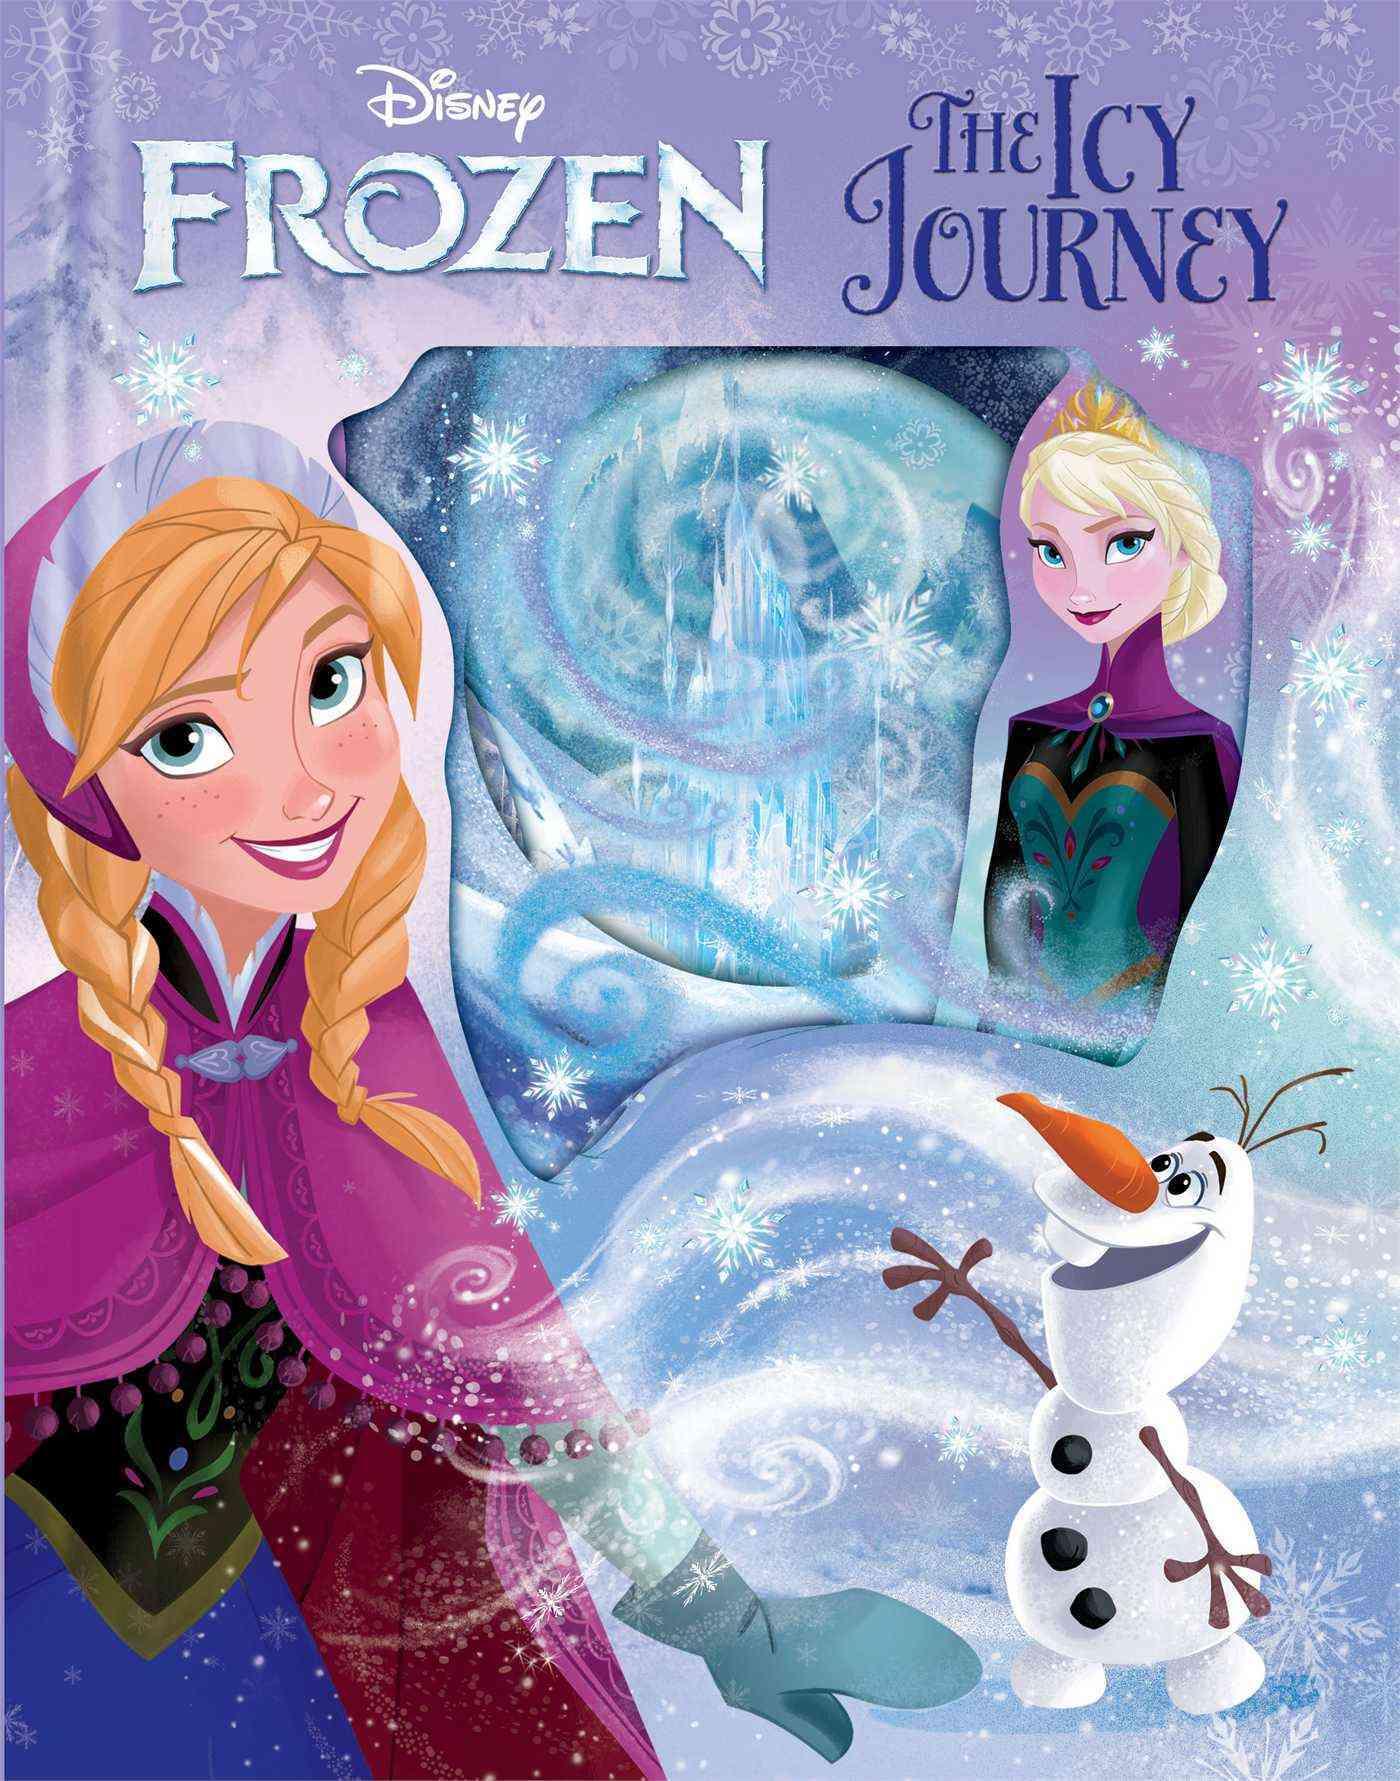 Disney Frozen the Icy Journey By Disney Frozen (CRT)